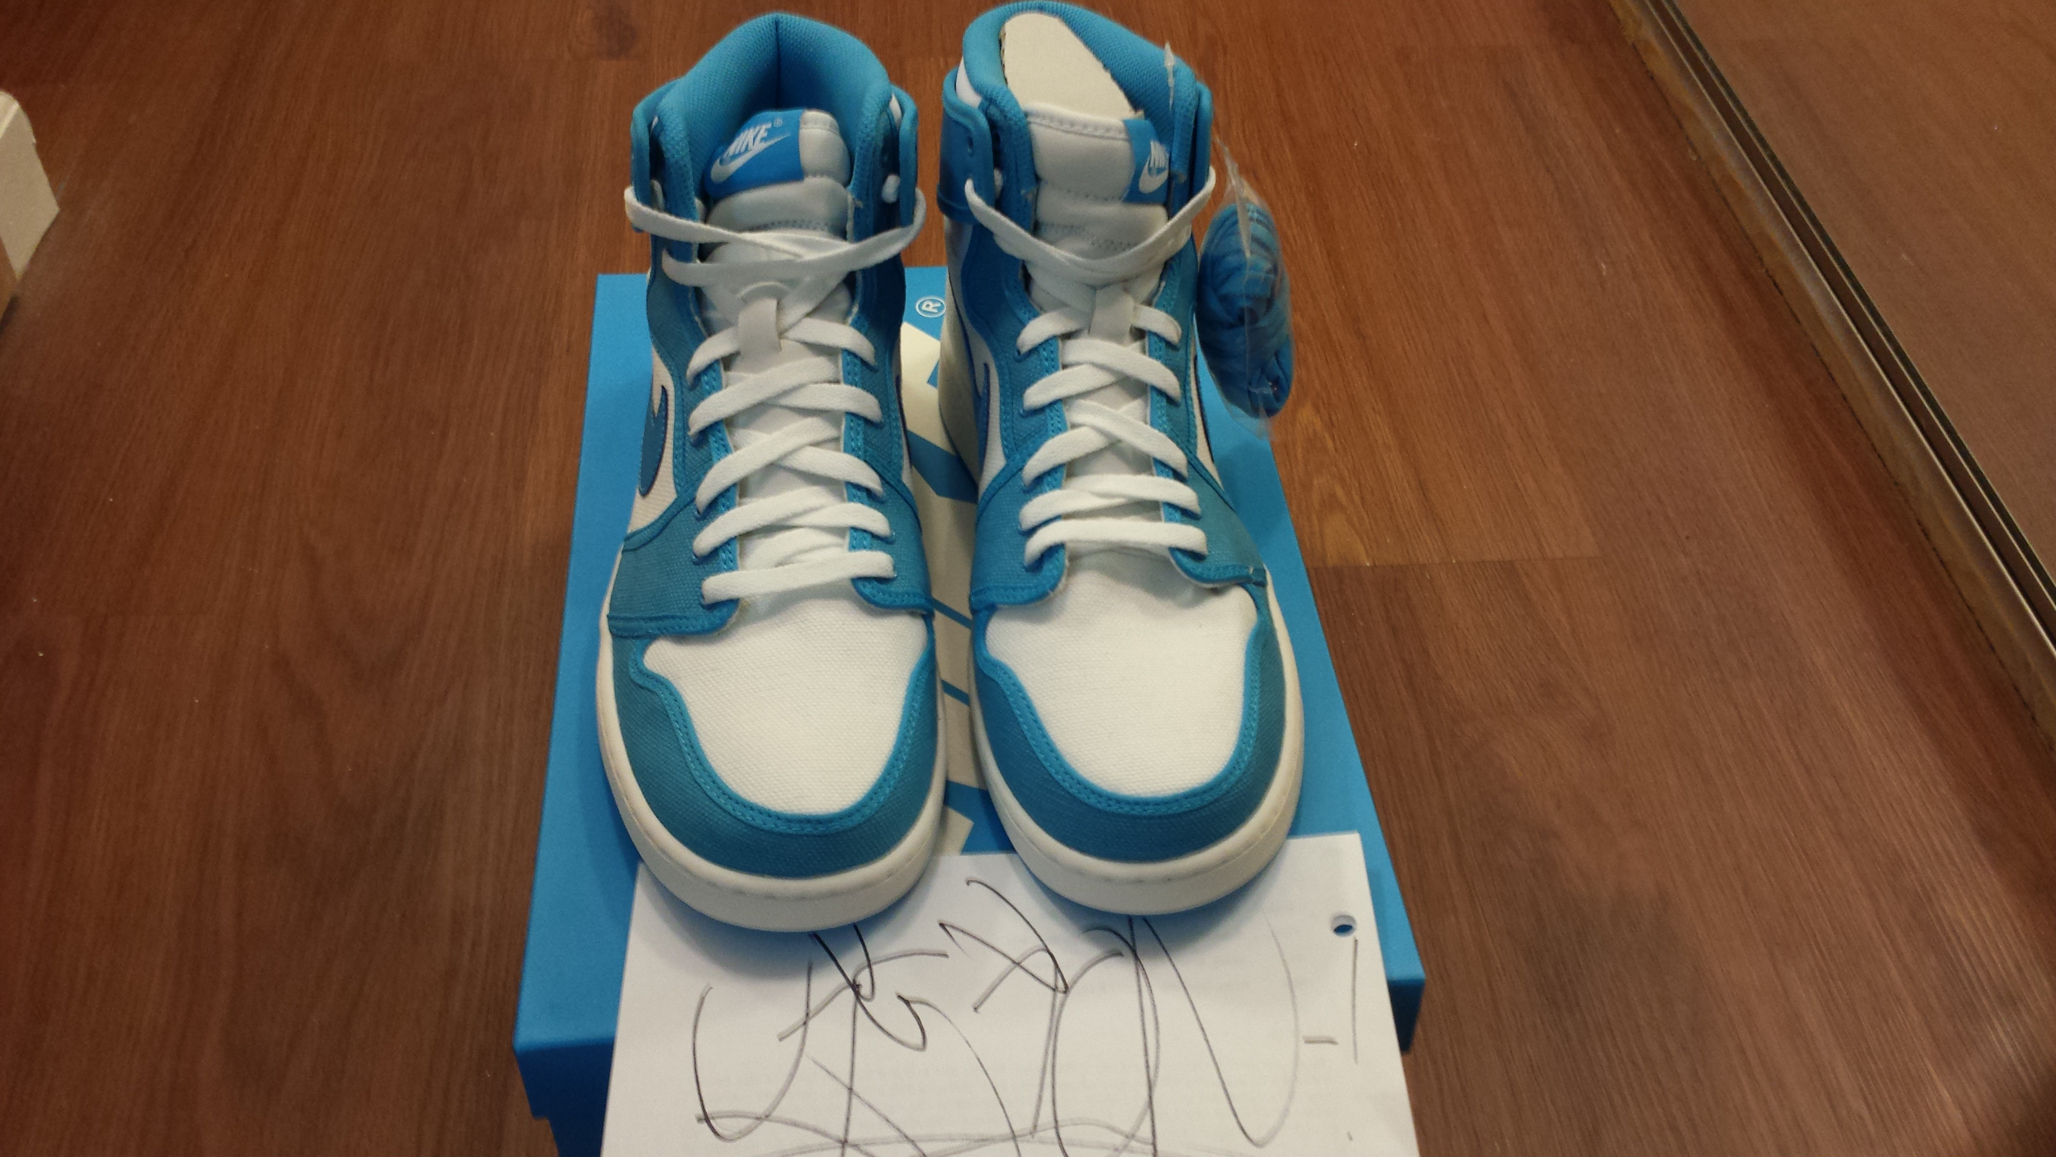 70893a8bb10 Nike Air Jordan 1 AJKO UNC (from Rivalry Pack;size 11) - Thumbnail ...